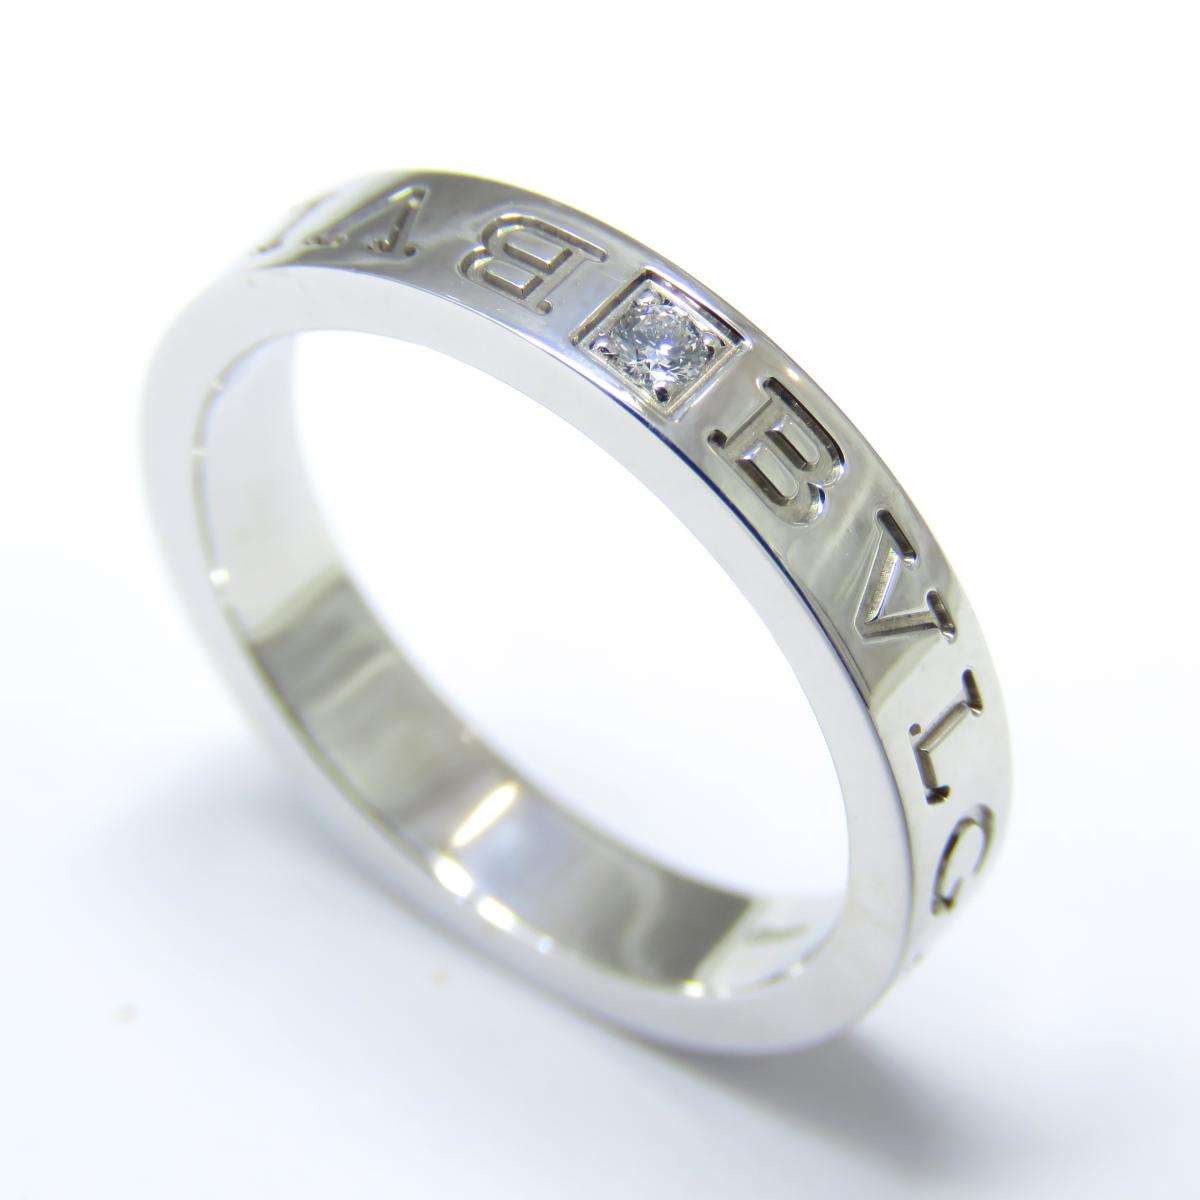 BVLGARI(ブルガリ)/ダブルロゴリング1PD リング 指輪/リング//K18WG(750)ホワイトゴールド/【ランクA】(#18.5号/8.1g)/18.5号【中古】